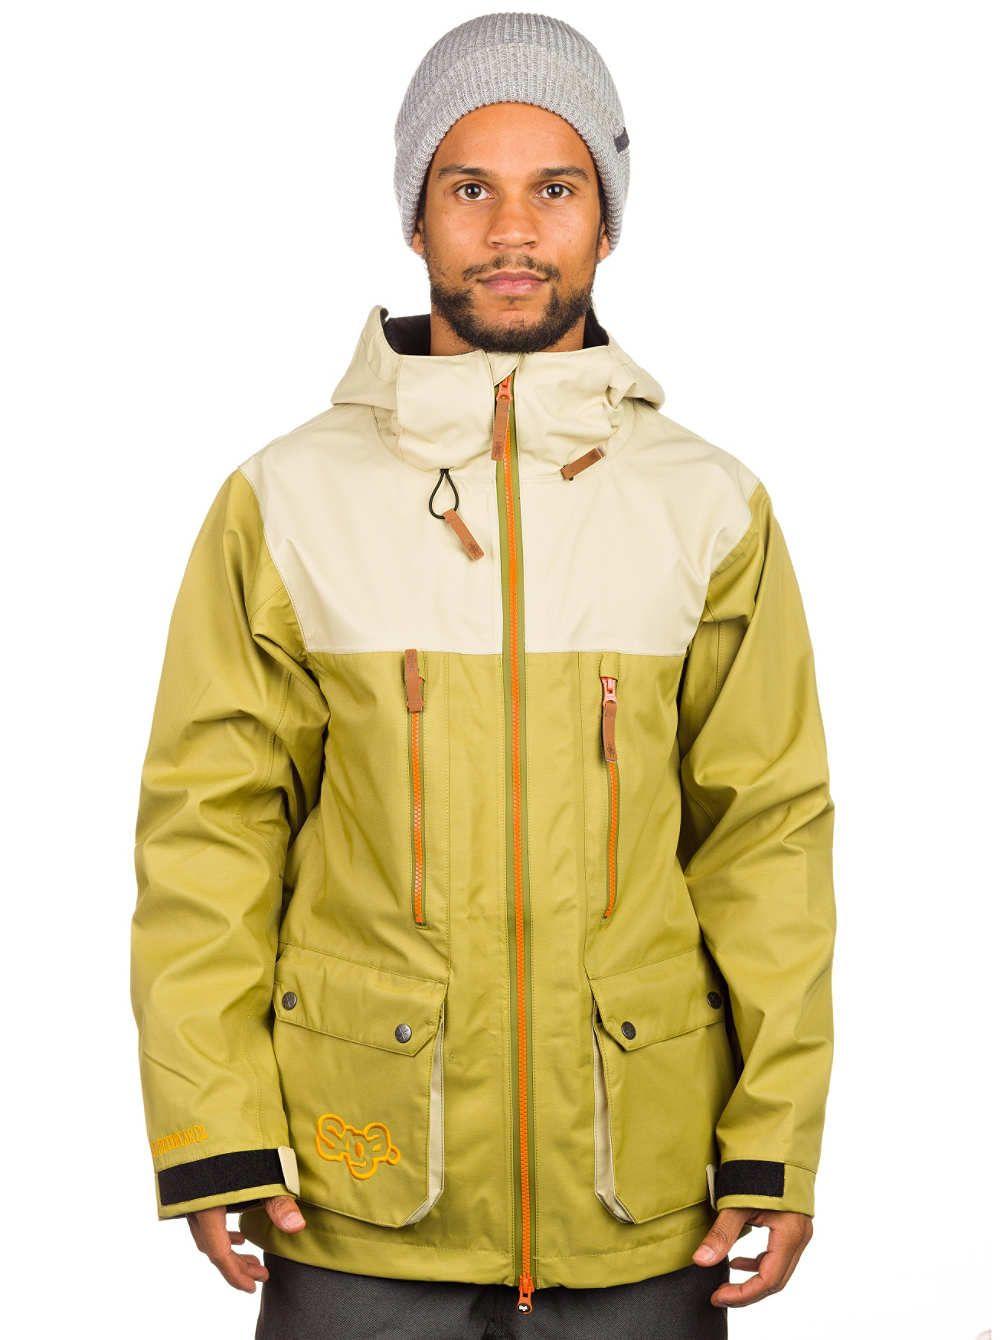 Order Saga Outerwear Monarch Jacket Online In The Blue Tomato Shop Saga Outerwear Jackets Online Online Blue [ 1340 x 1006 Pixel ]